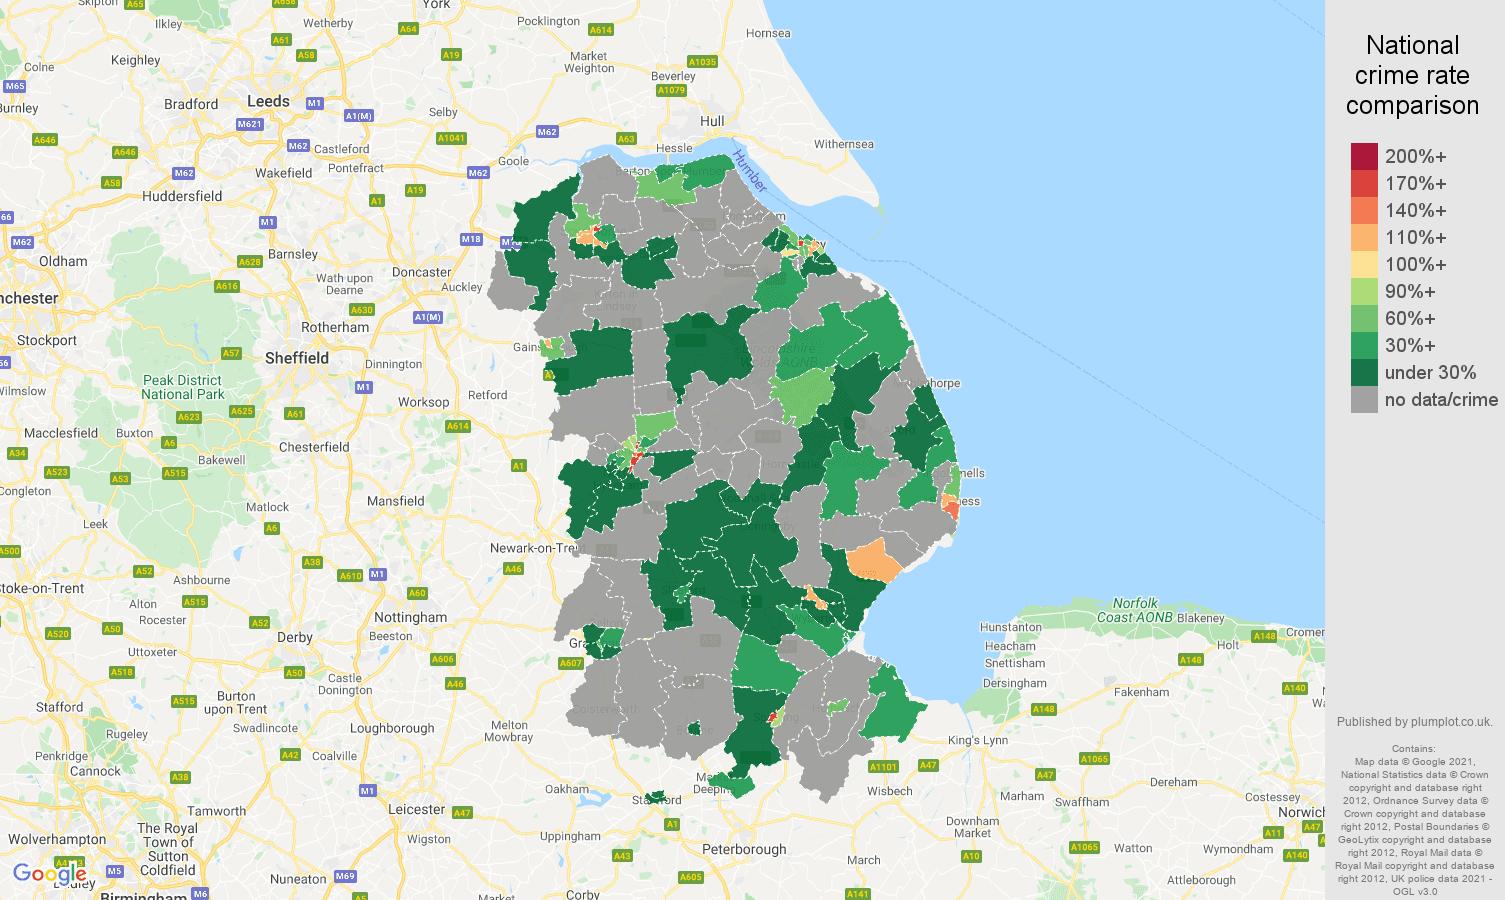 Lincolnshire robbery crime rate comparison map